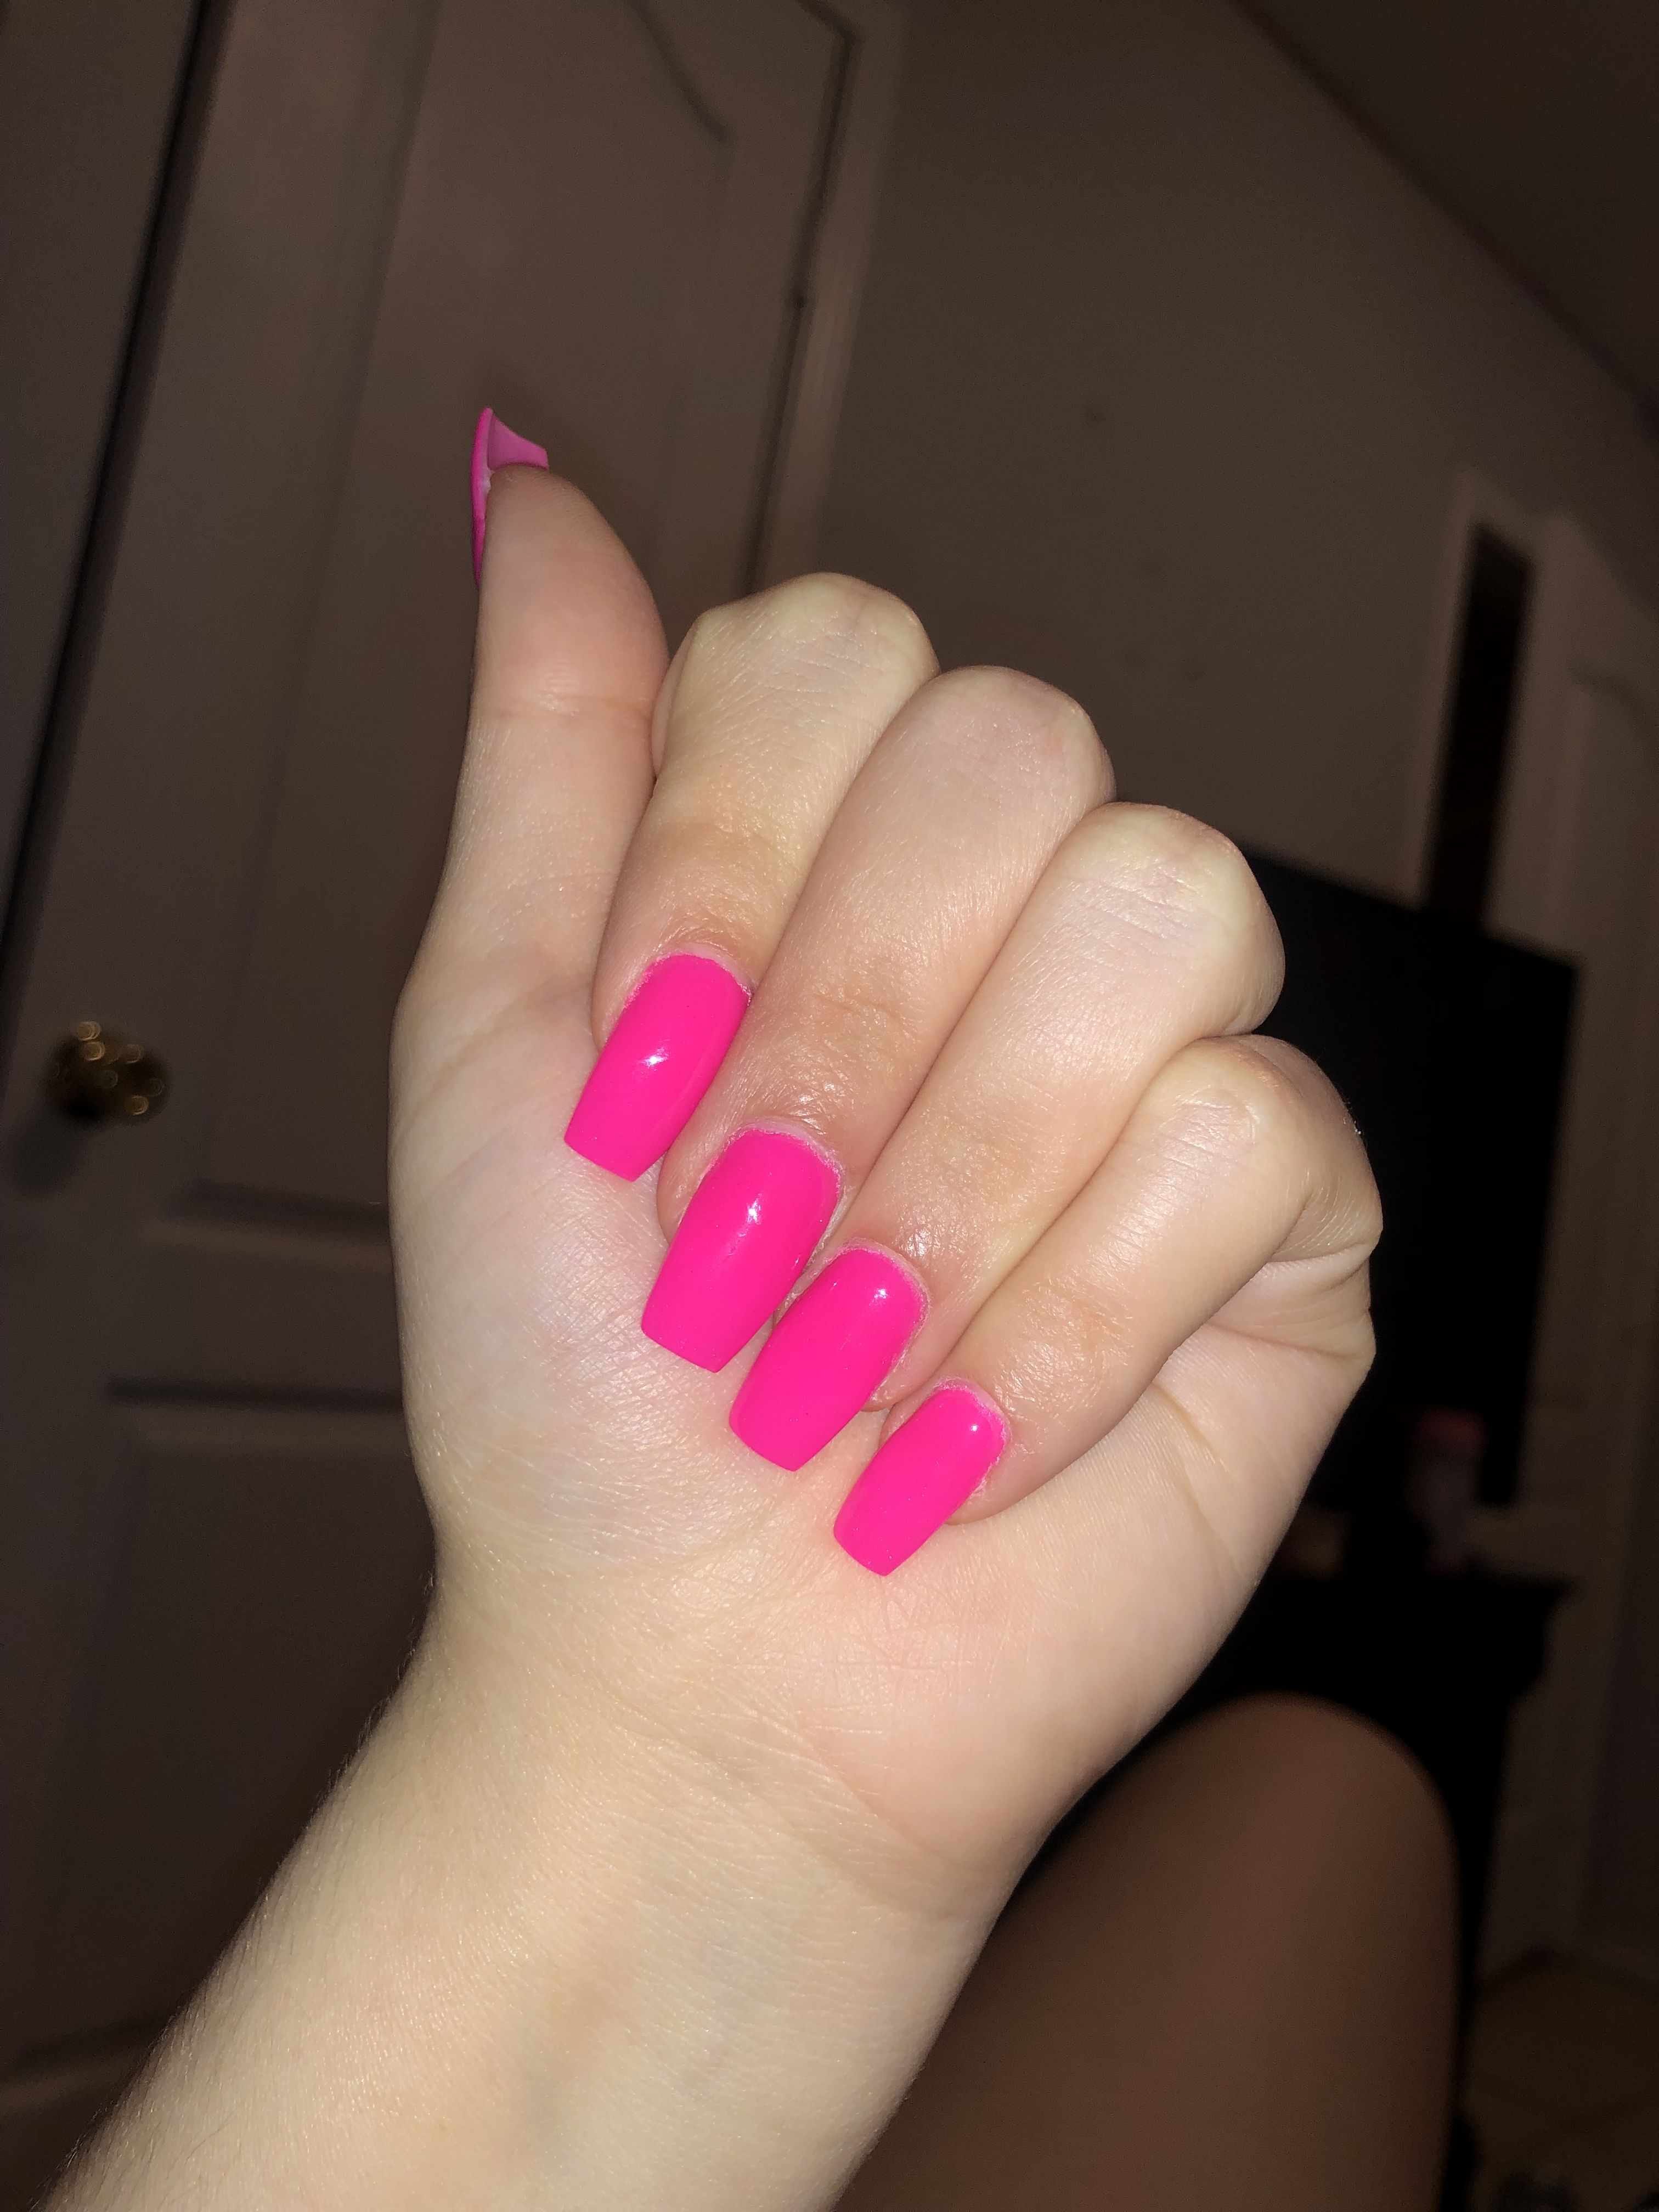 Pin By Valerie Garcia On Nails Nail Colors Pink Nails Hot Pink Nails